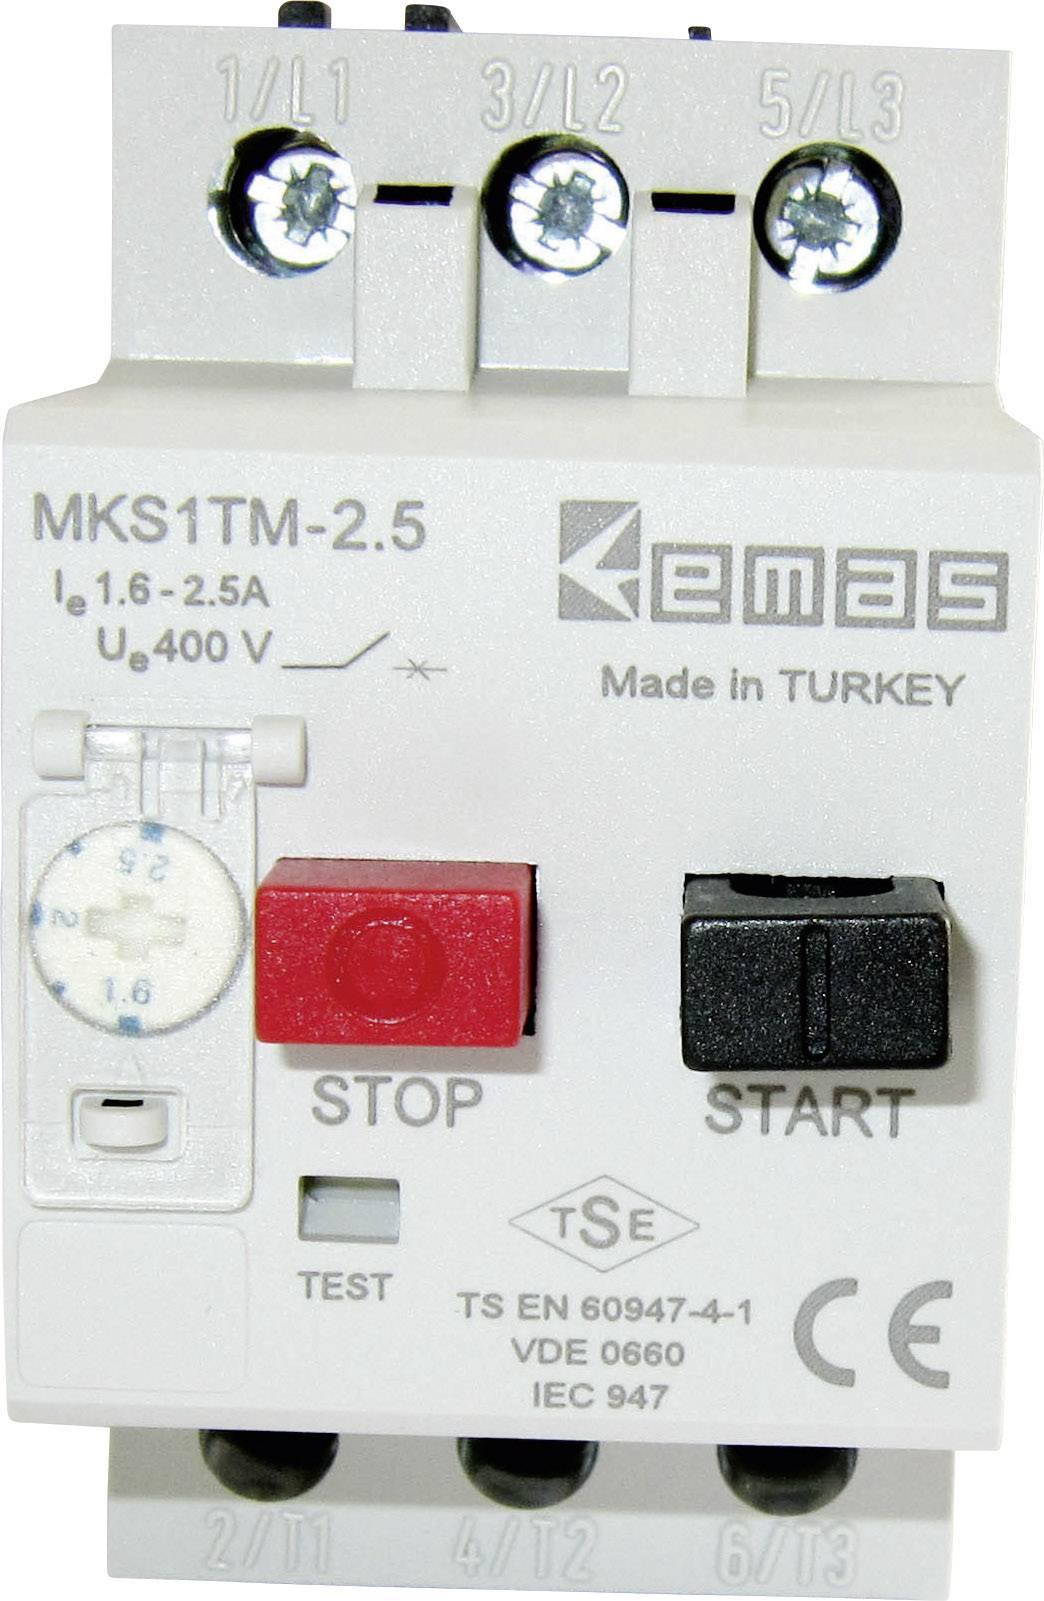 Ochranný spínač motora EMAS MKS1TM-2.5 MKS1TM-2.5, 400 V/AC, 2.5 A, 1 ks